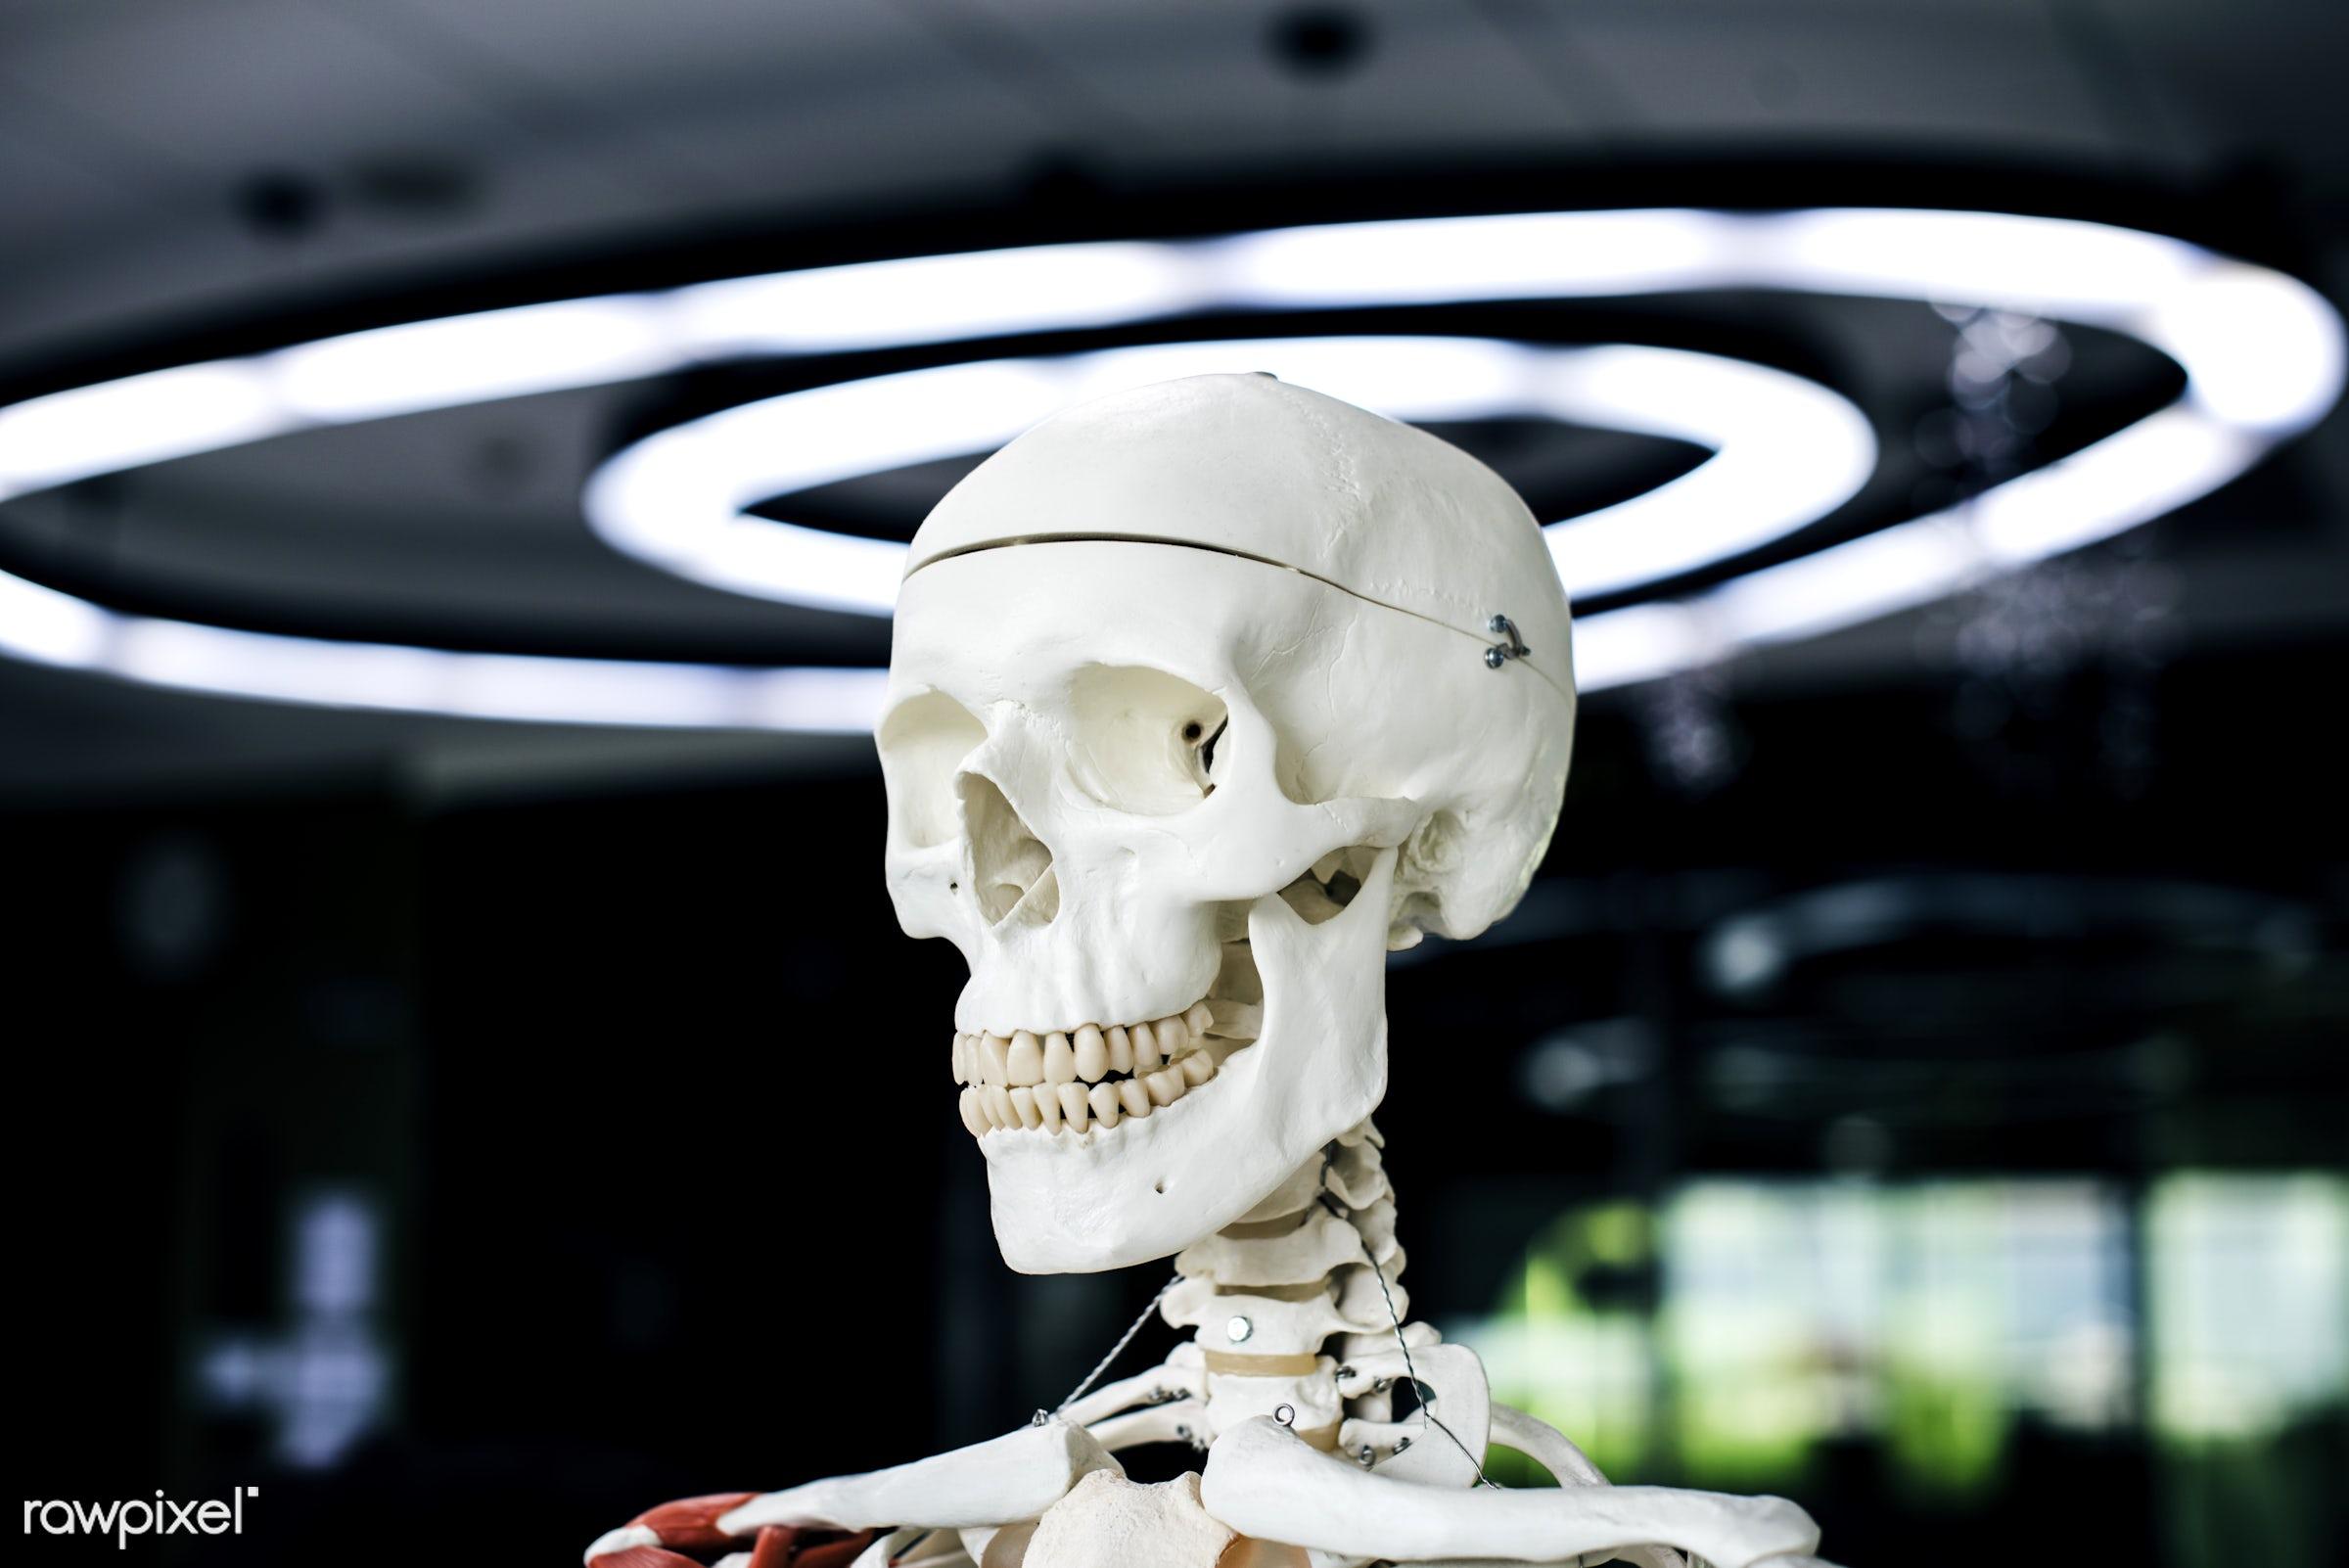 nobody, body, structure, model, study, skeleton, object, science, human, skull, anatomy, bones, learn, learning, teenager,...